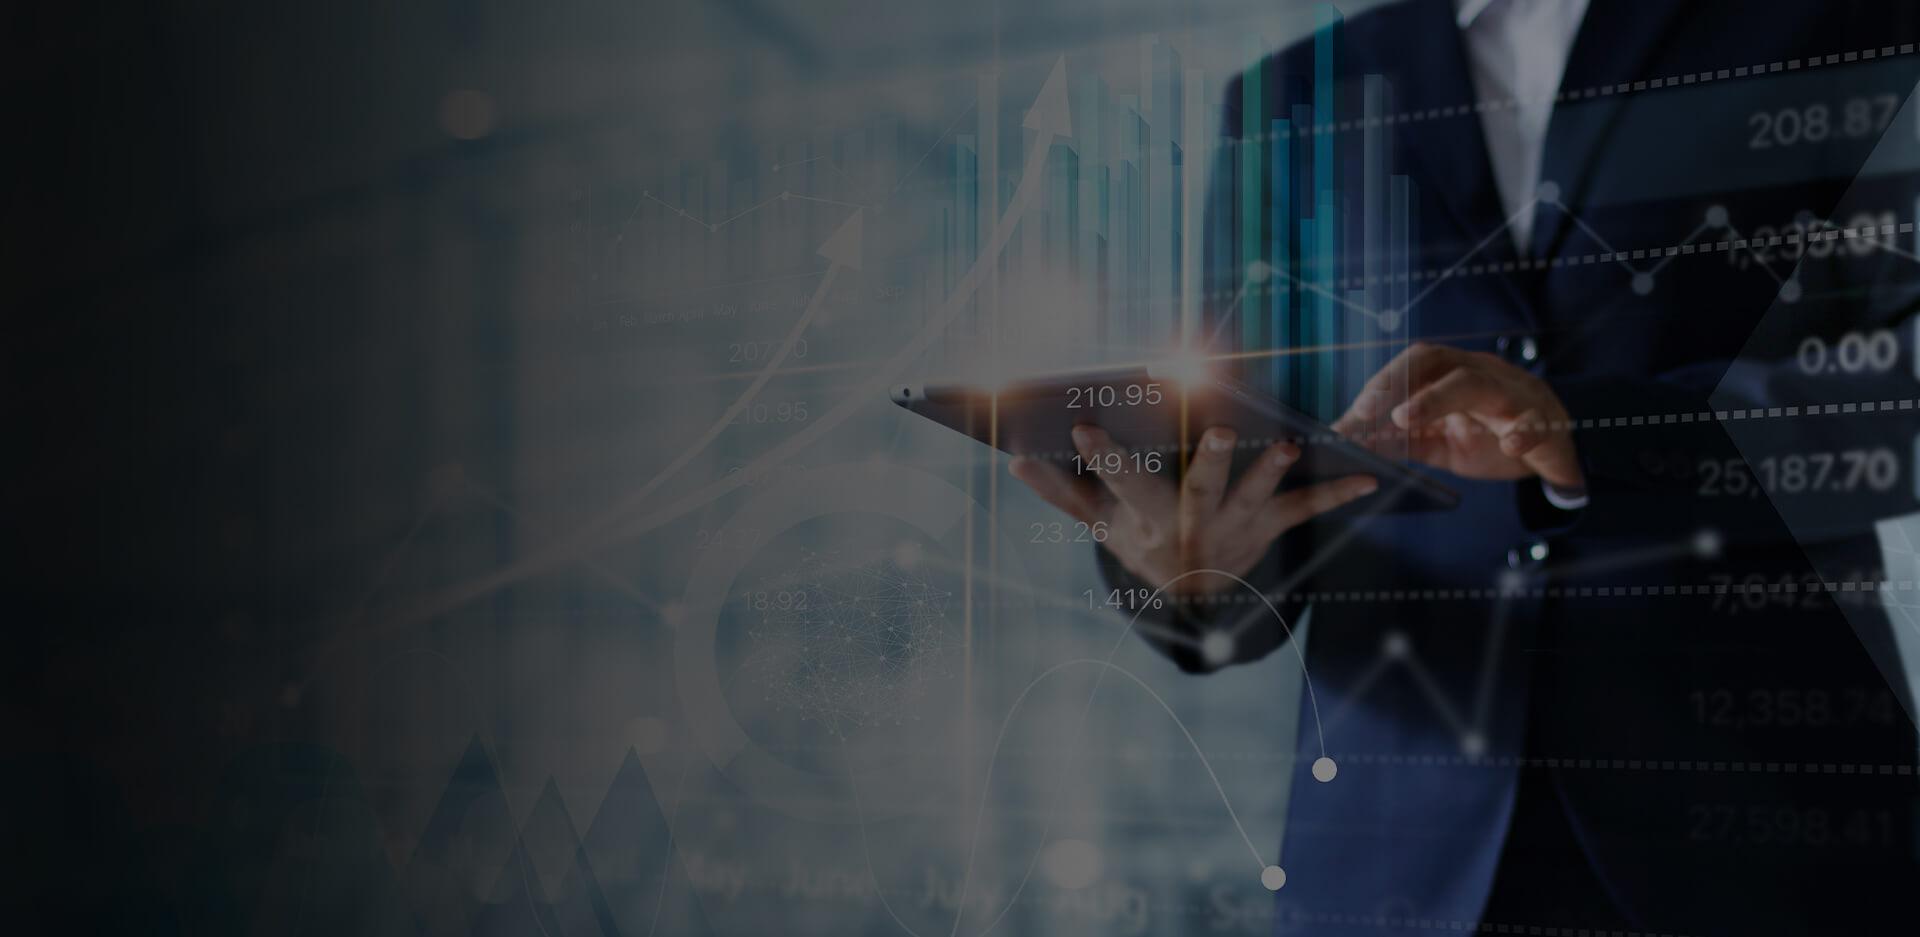 Modernized core IT infrastructure for next-gen banking